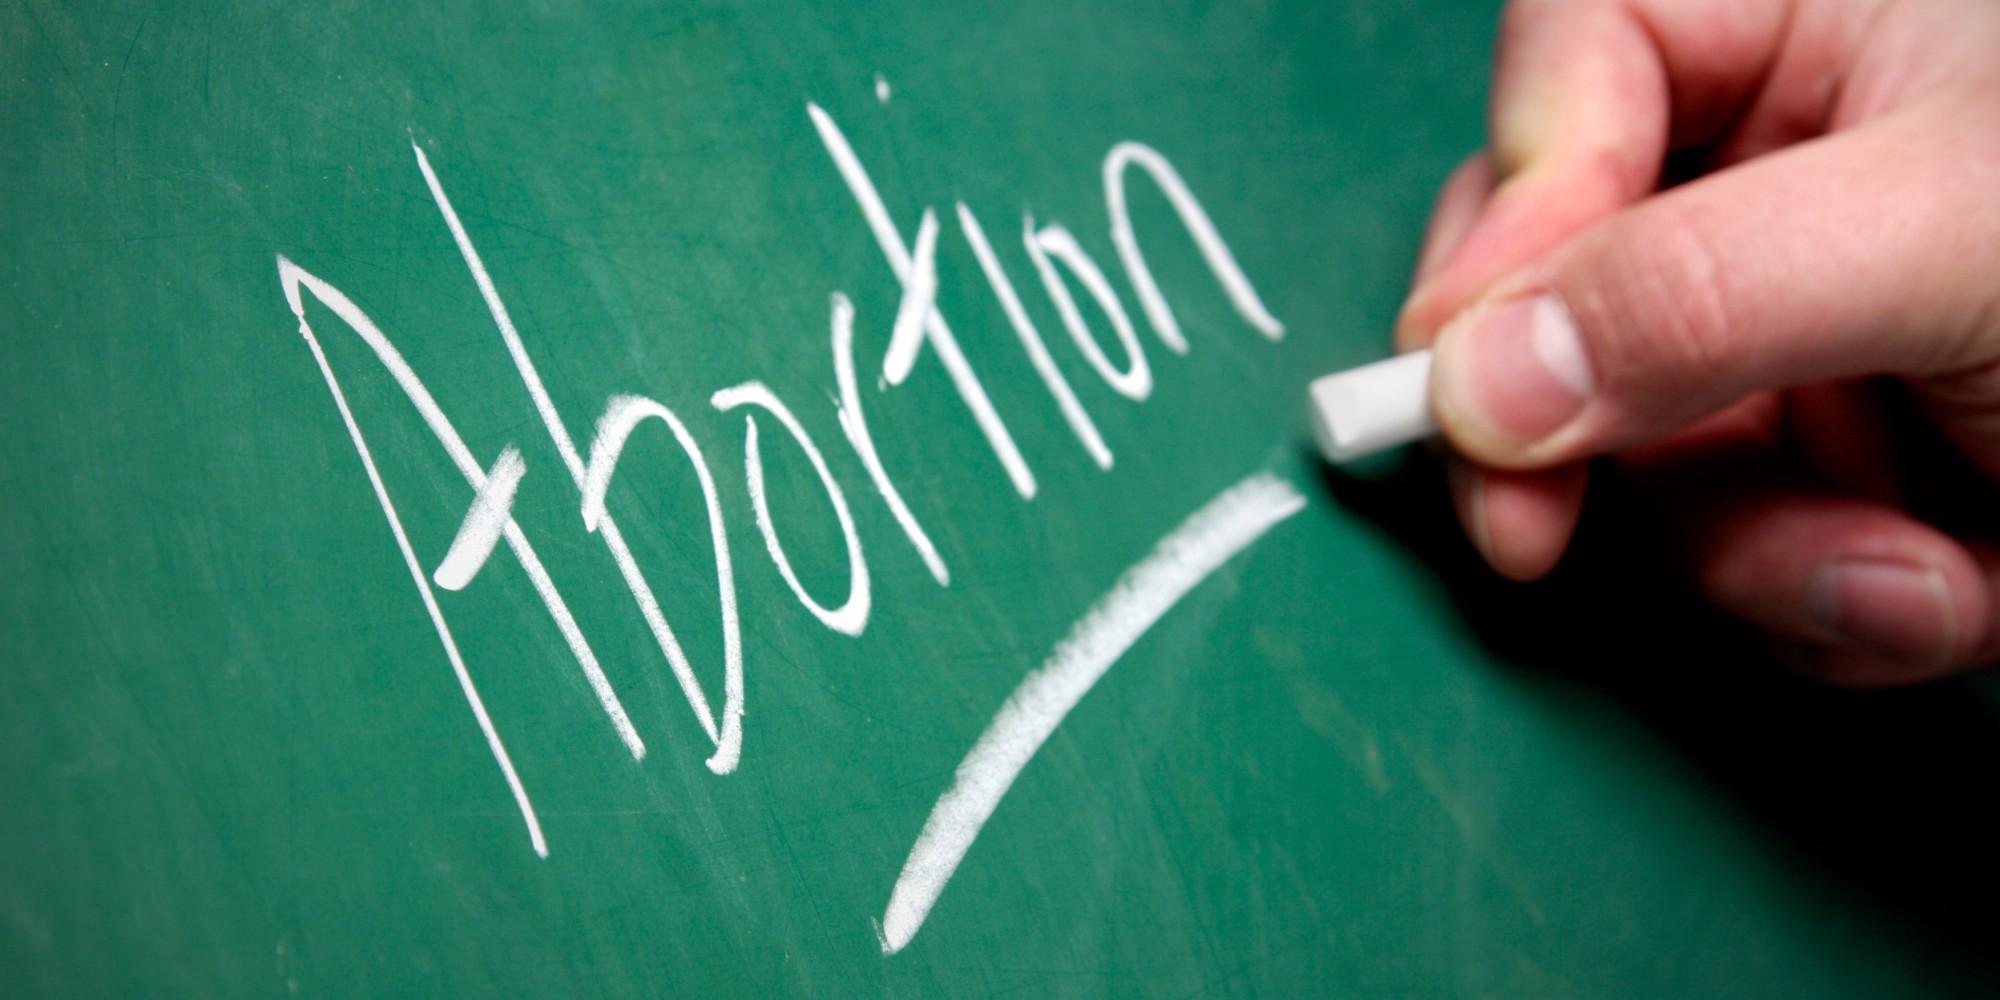 abortion clinic in mumbai